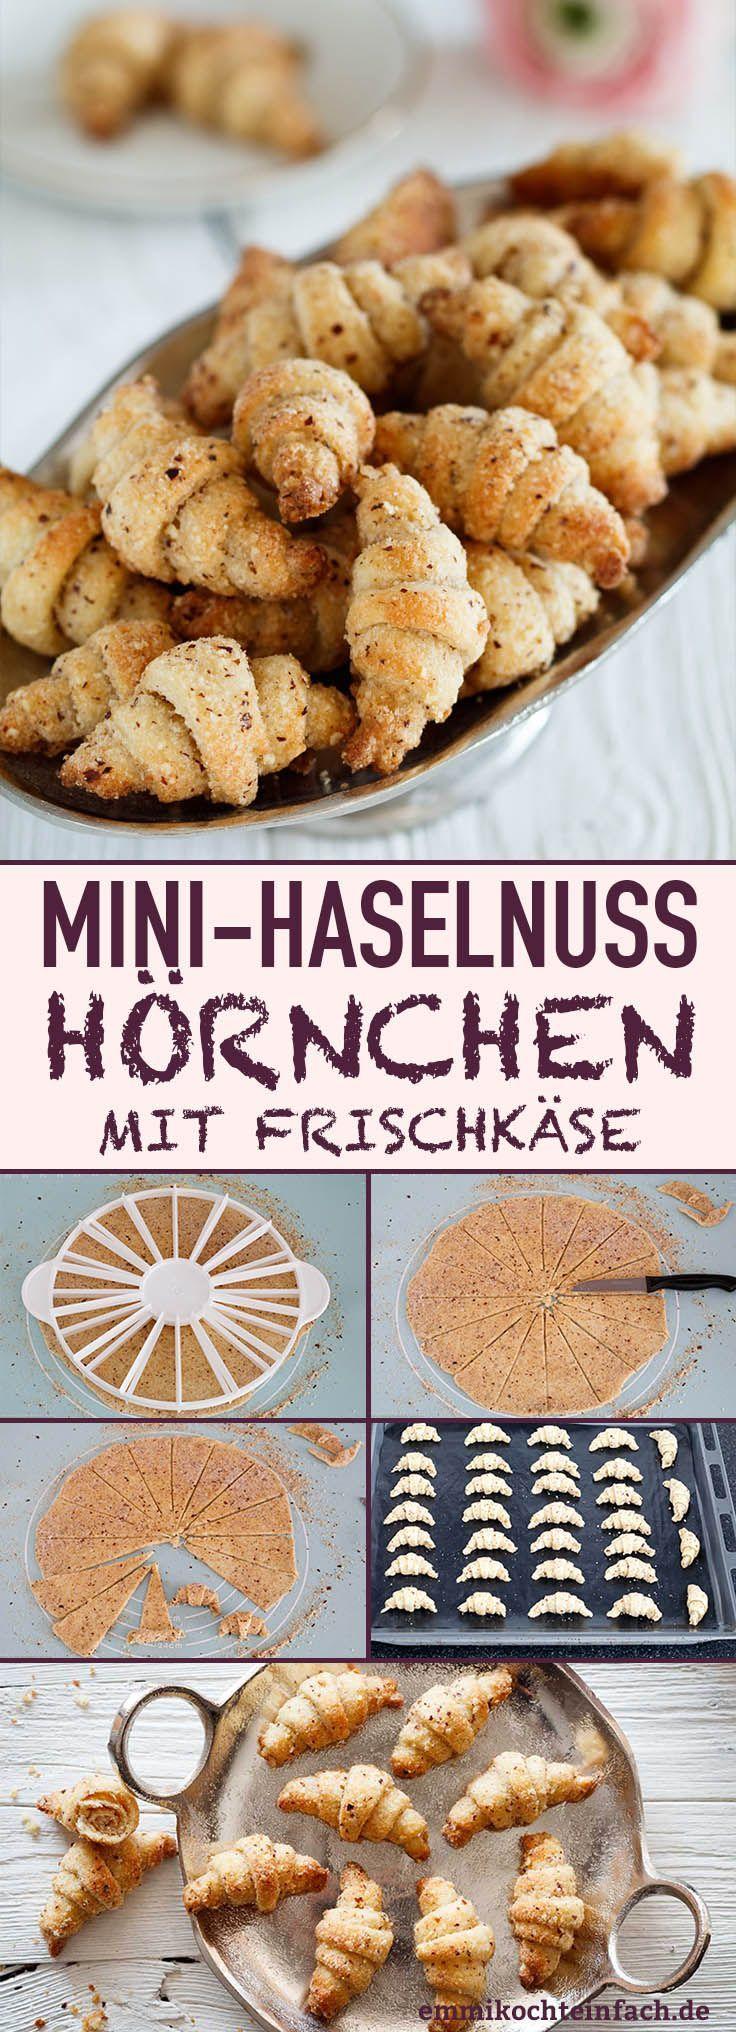 Mini-Haselnuss-Hörnchen mit Frischkäse